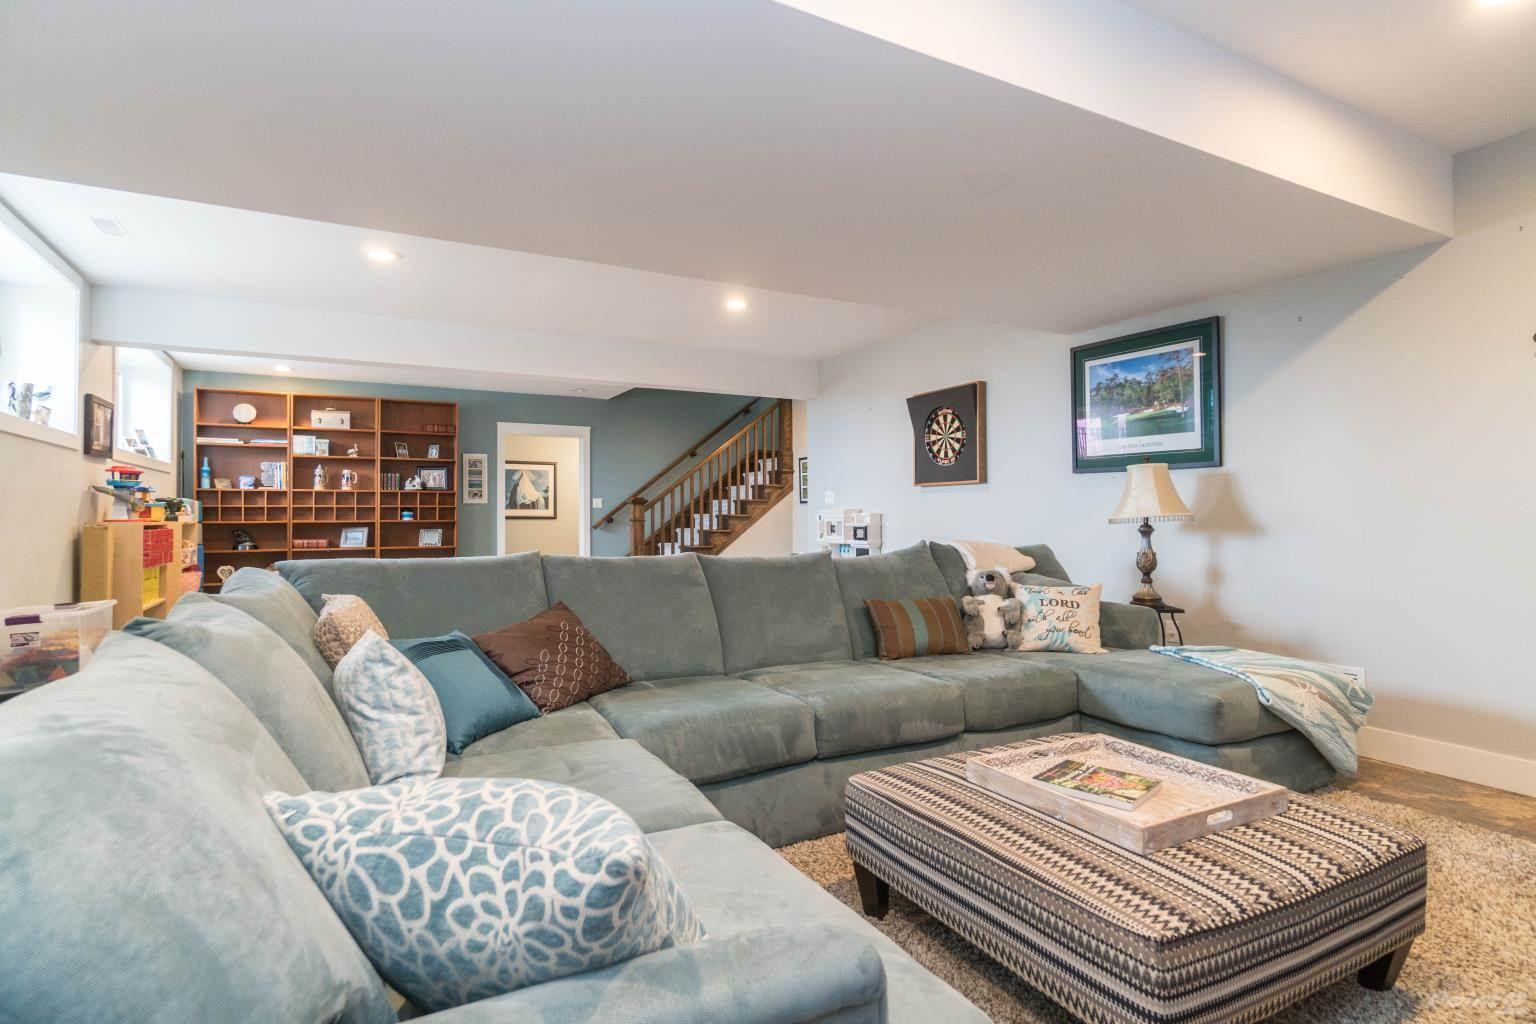 Donaldston Rd in Donaldston - House For Sale : MLS# null Photo 25